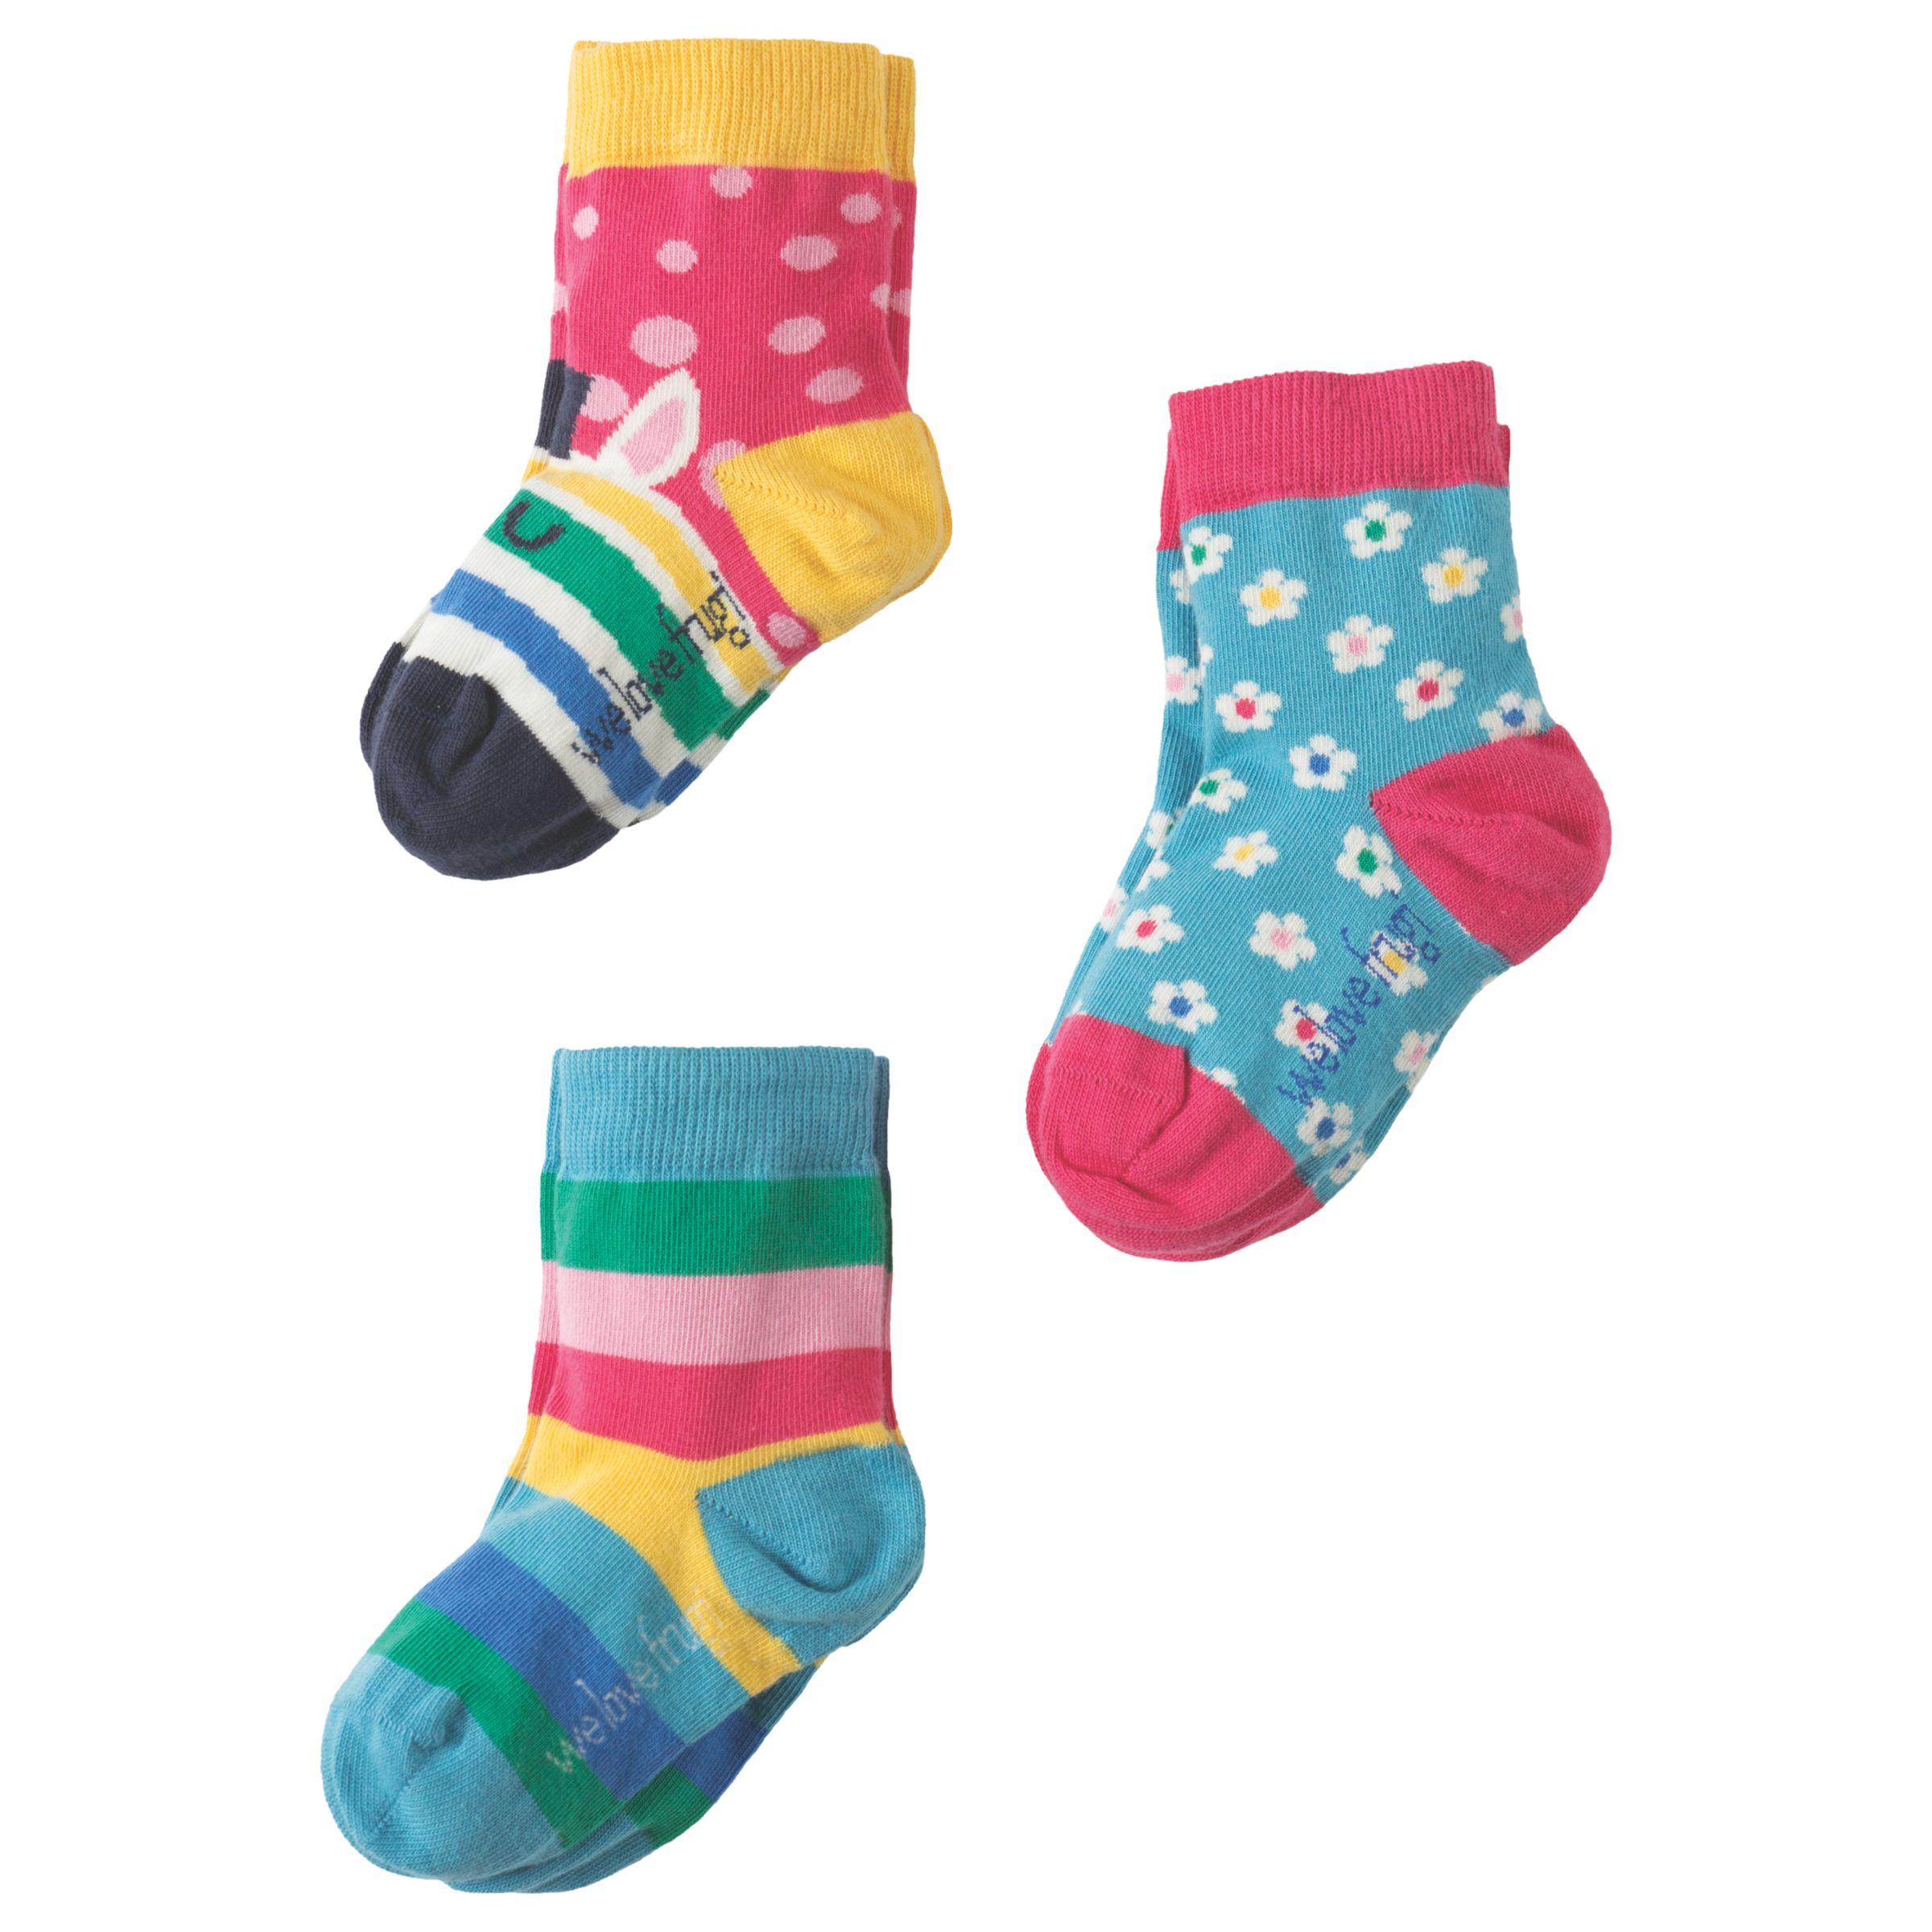 Frugi Organic Frugi Organic Girls' Susie Socks, Pack of 3, Multi